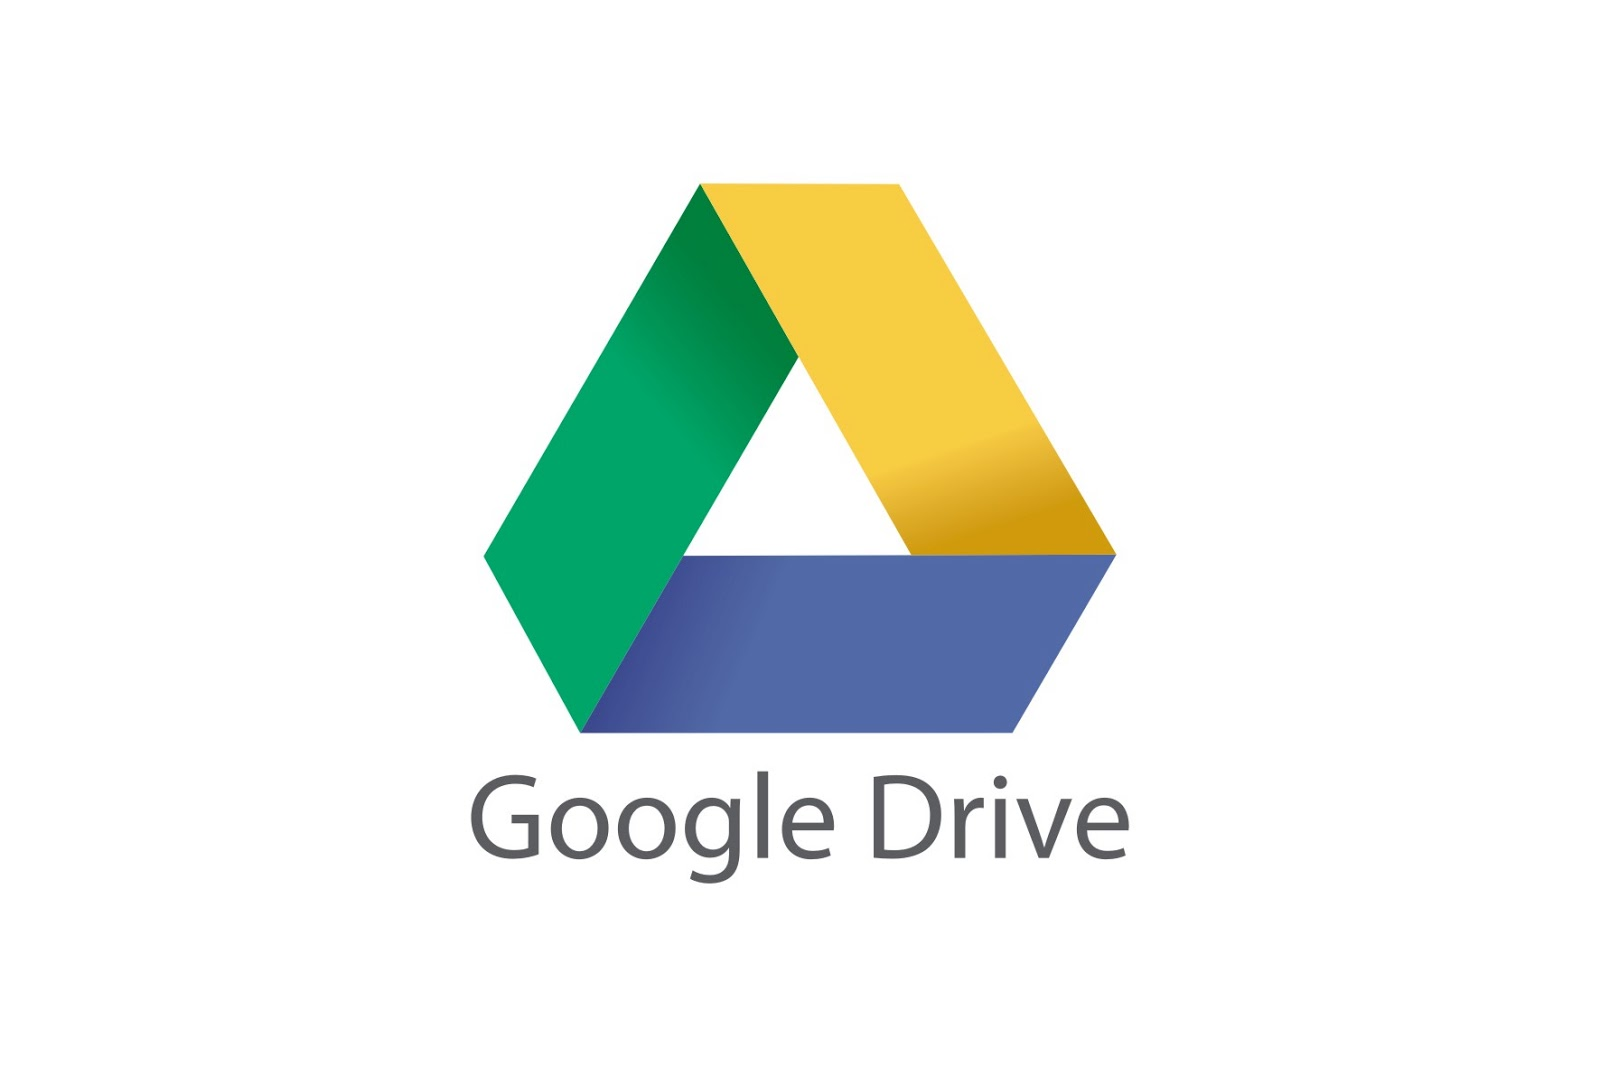 Gooog Drive 無限空間應用-1 : 讓你有無限空間的D槽- ExpanDrive